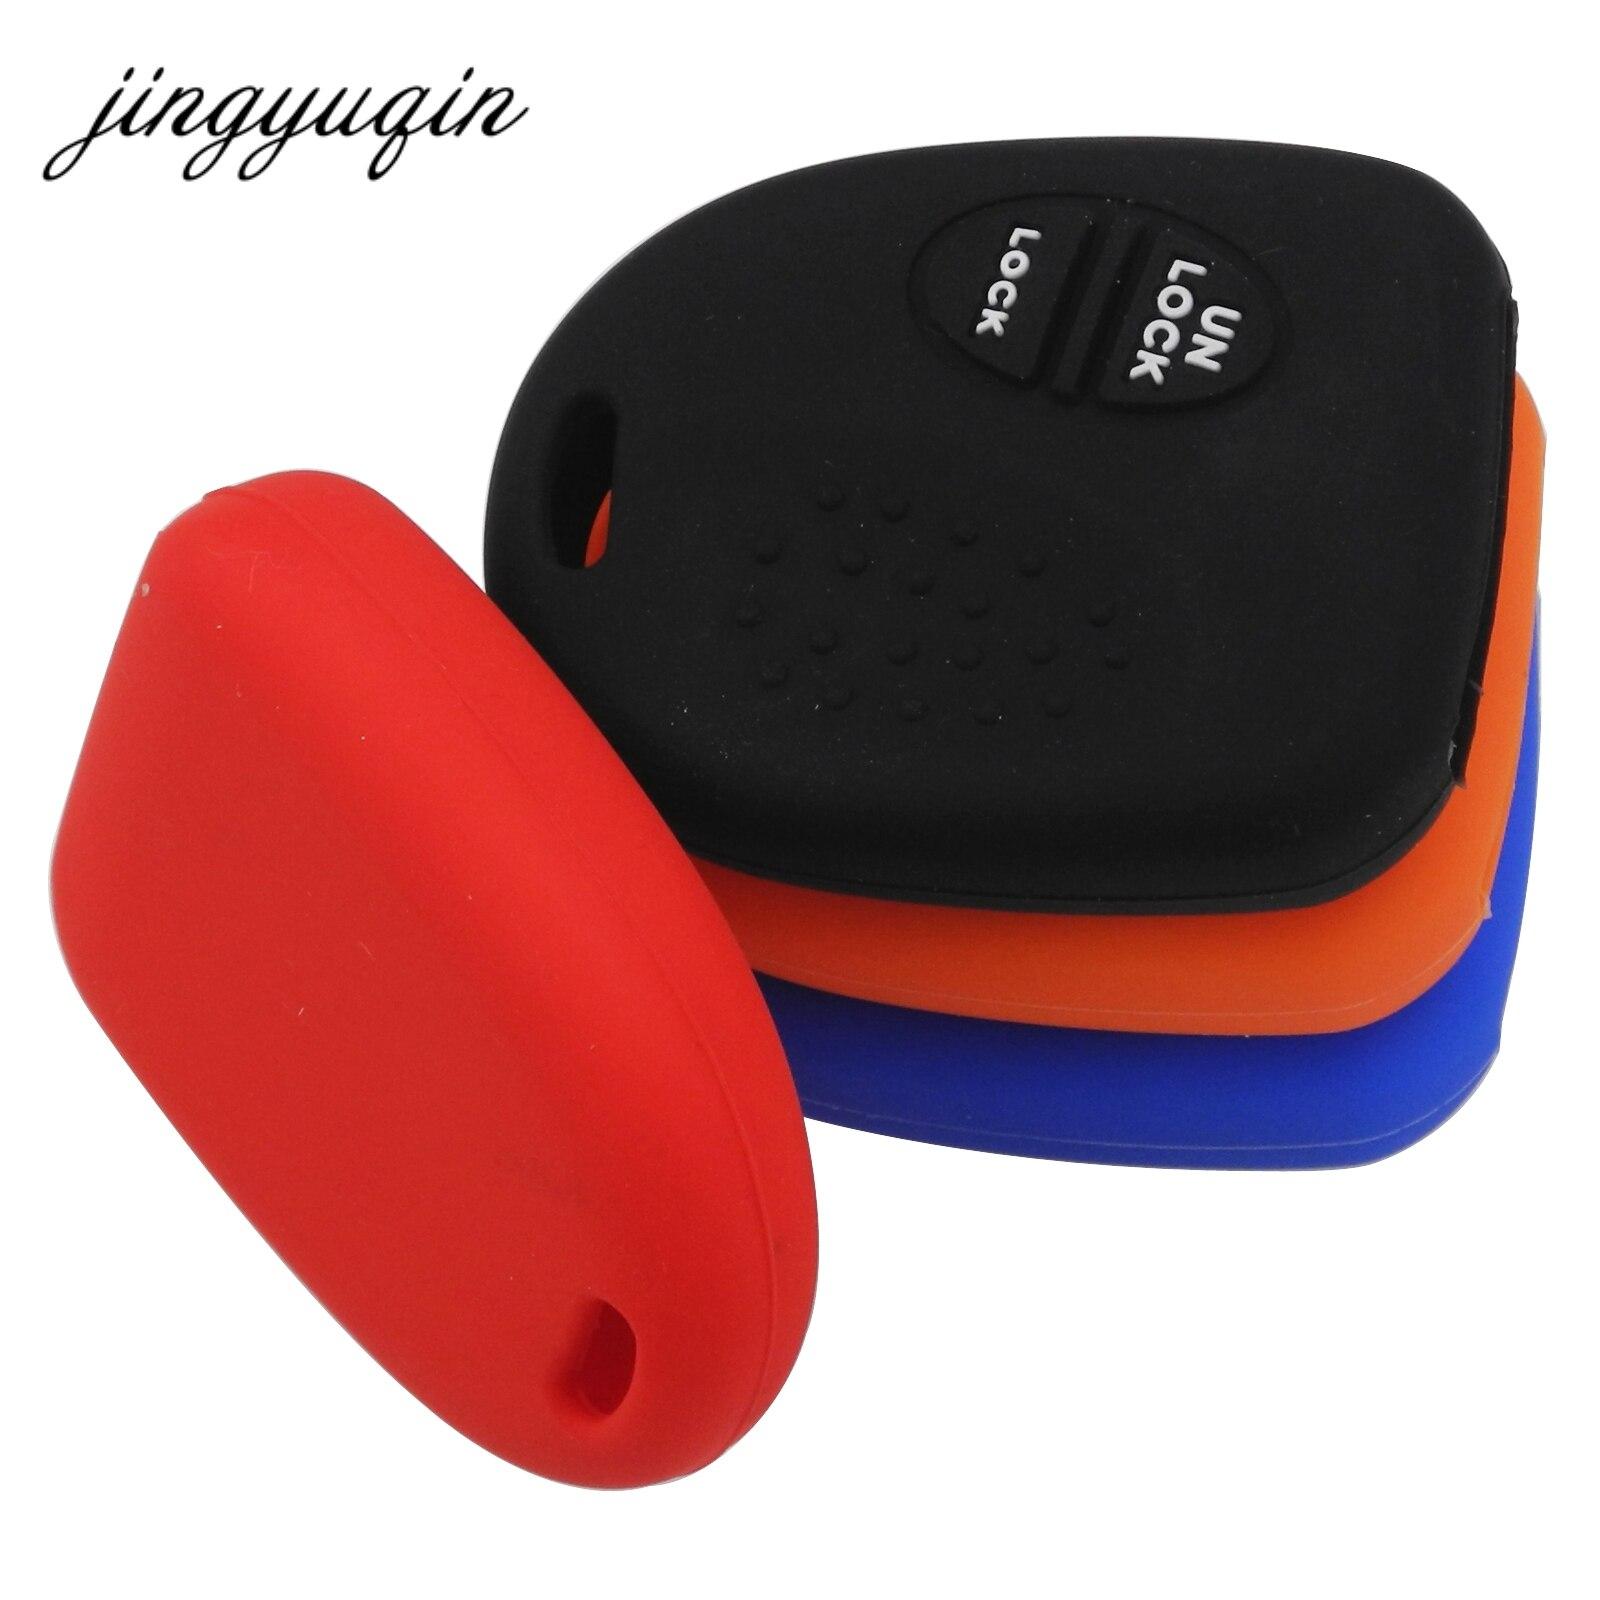 Jingyuqin 30 шт./лот силиконовый чехол ключ автомобиля FOB чехол для Холден Commodore Wh Wk Wl Vs Vt Vx В. Ю. В. З. для Chevrolet удаленный случае ключ